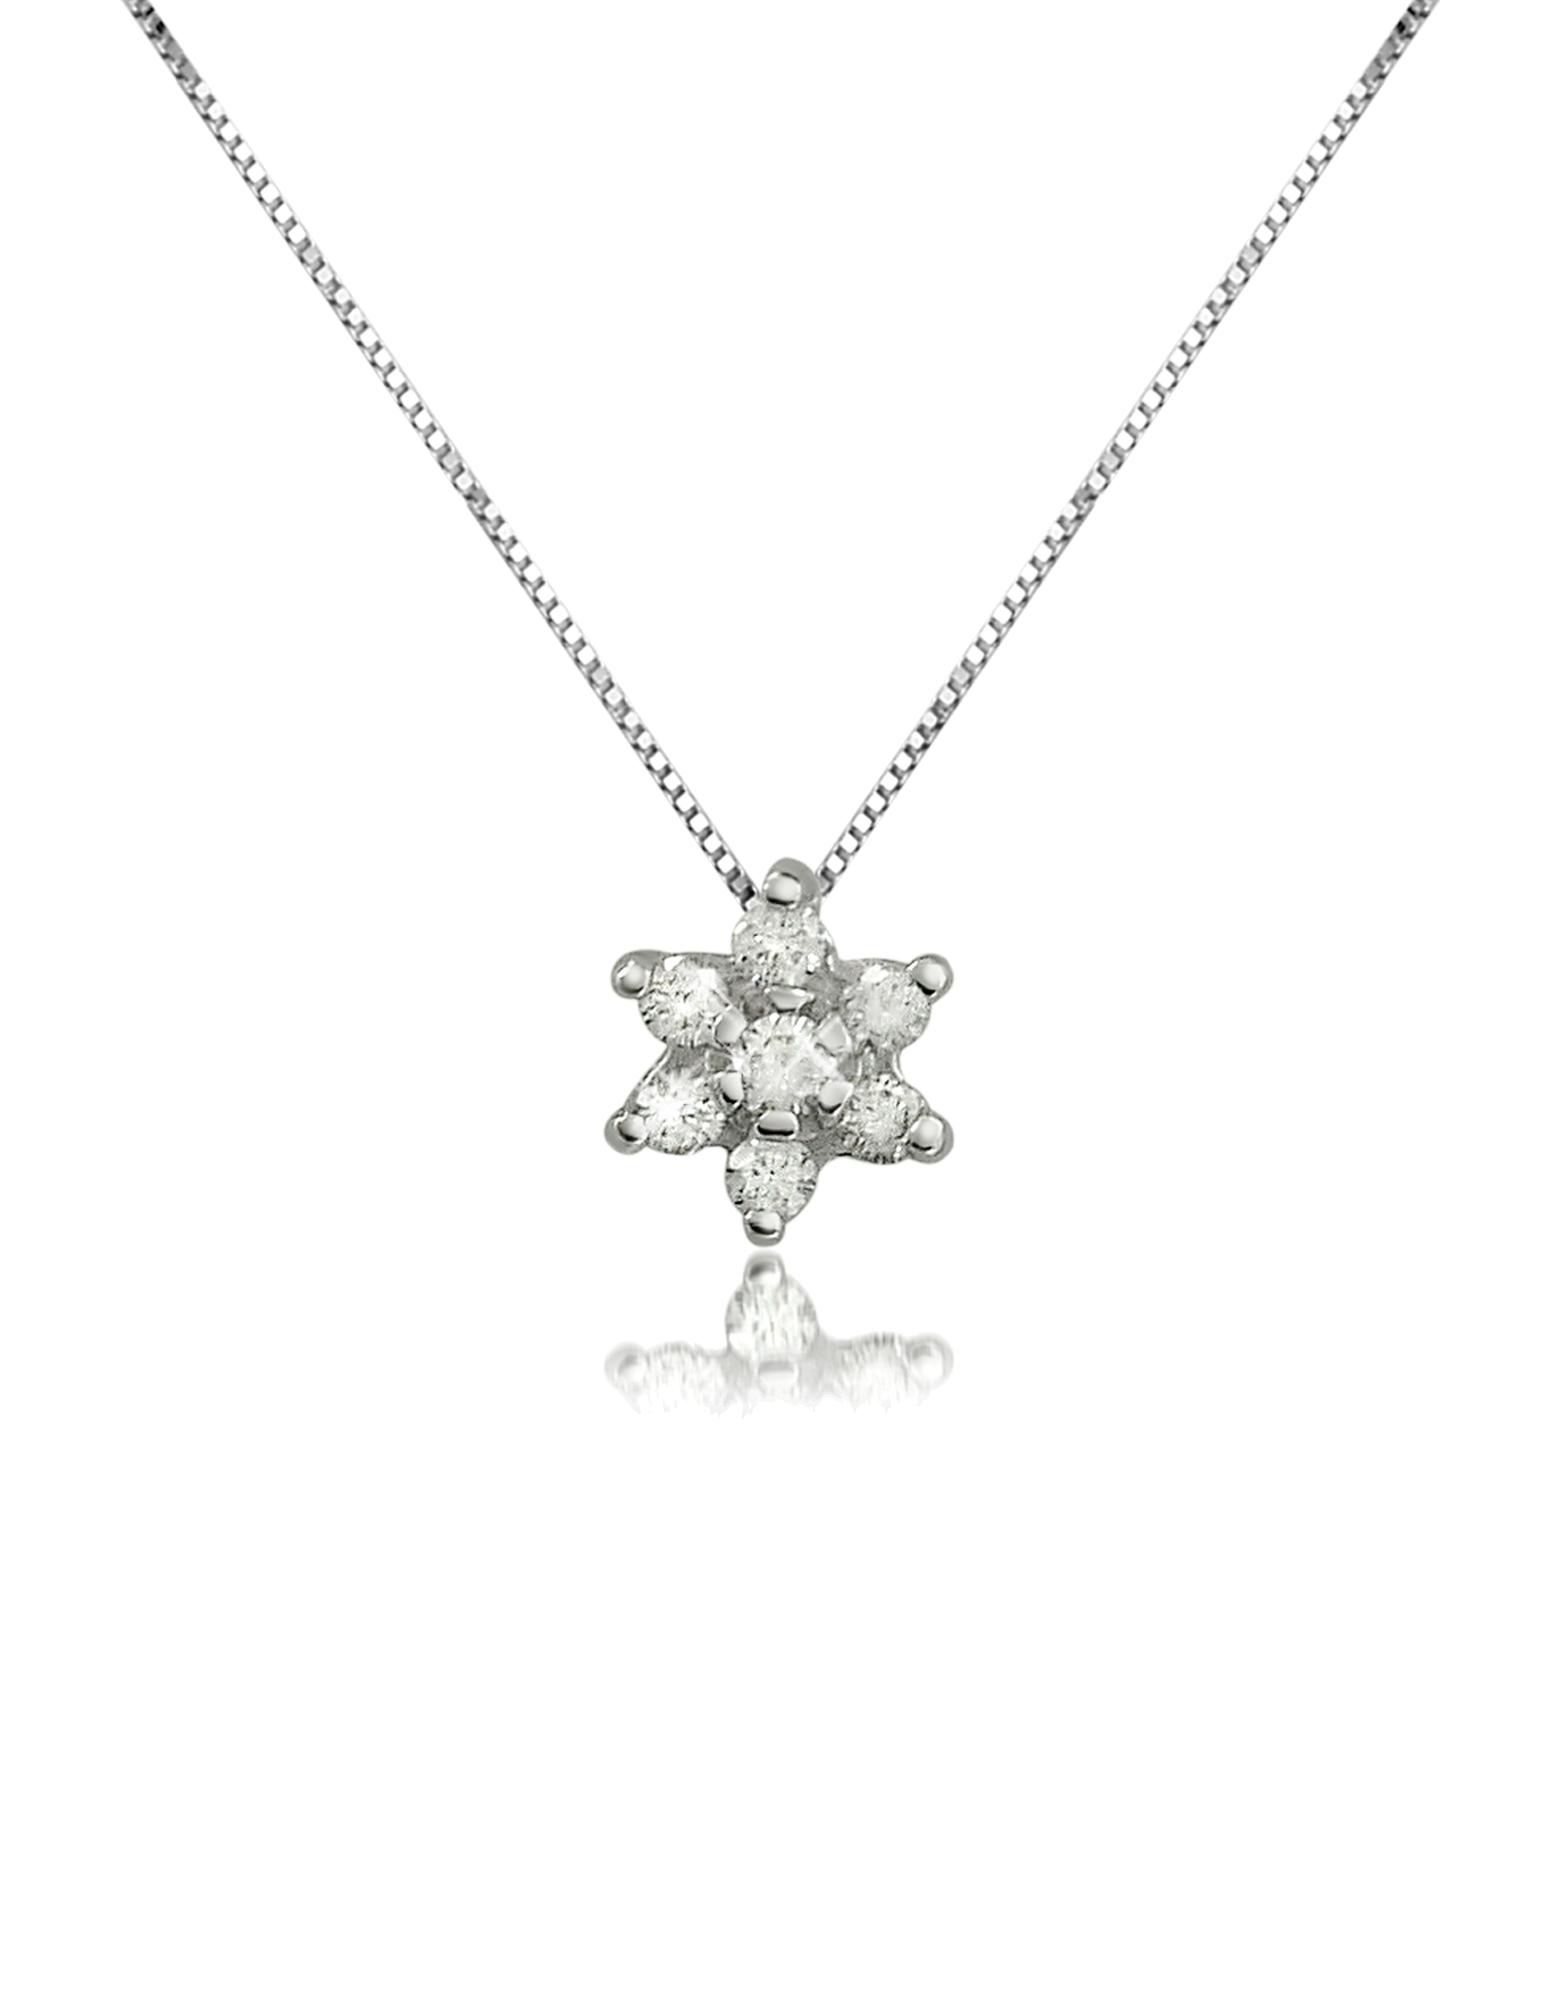 Image of 0.11 ct Diamond Flower 18K Gold Pendant Necklace